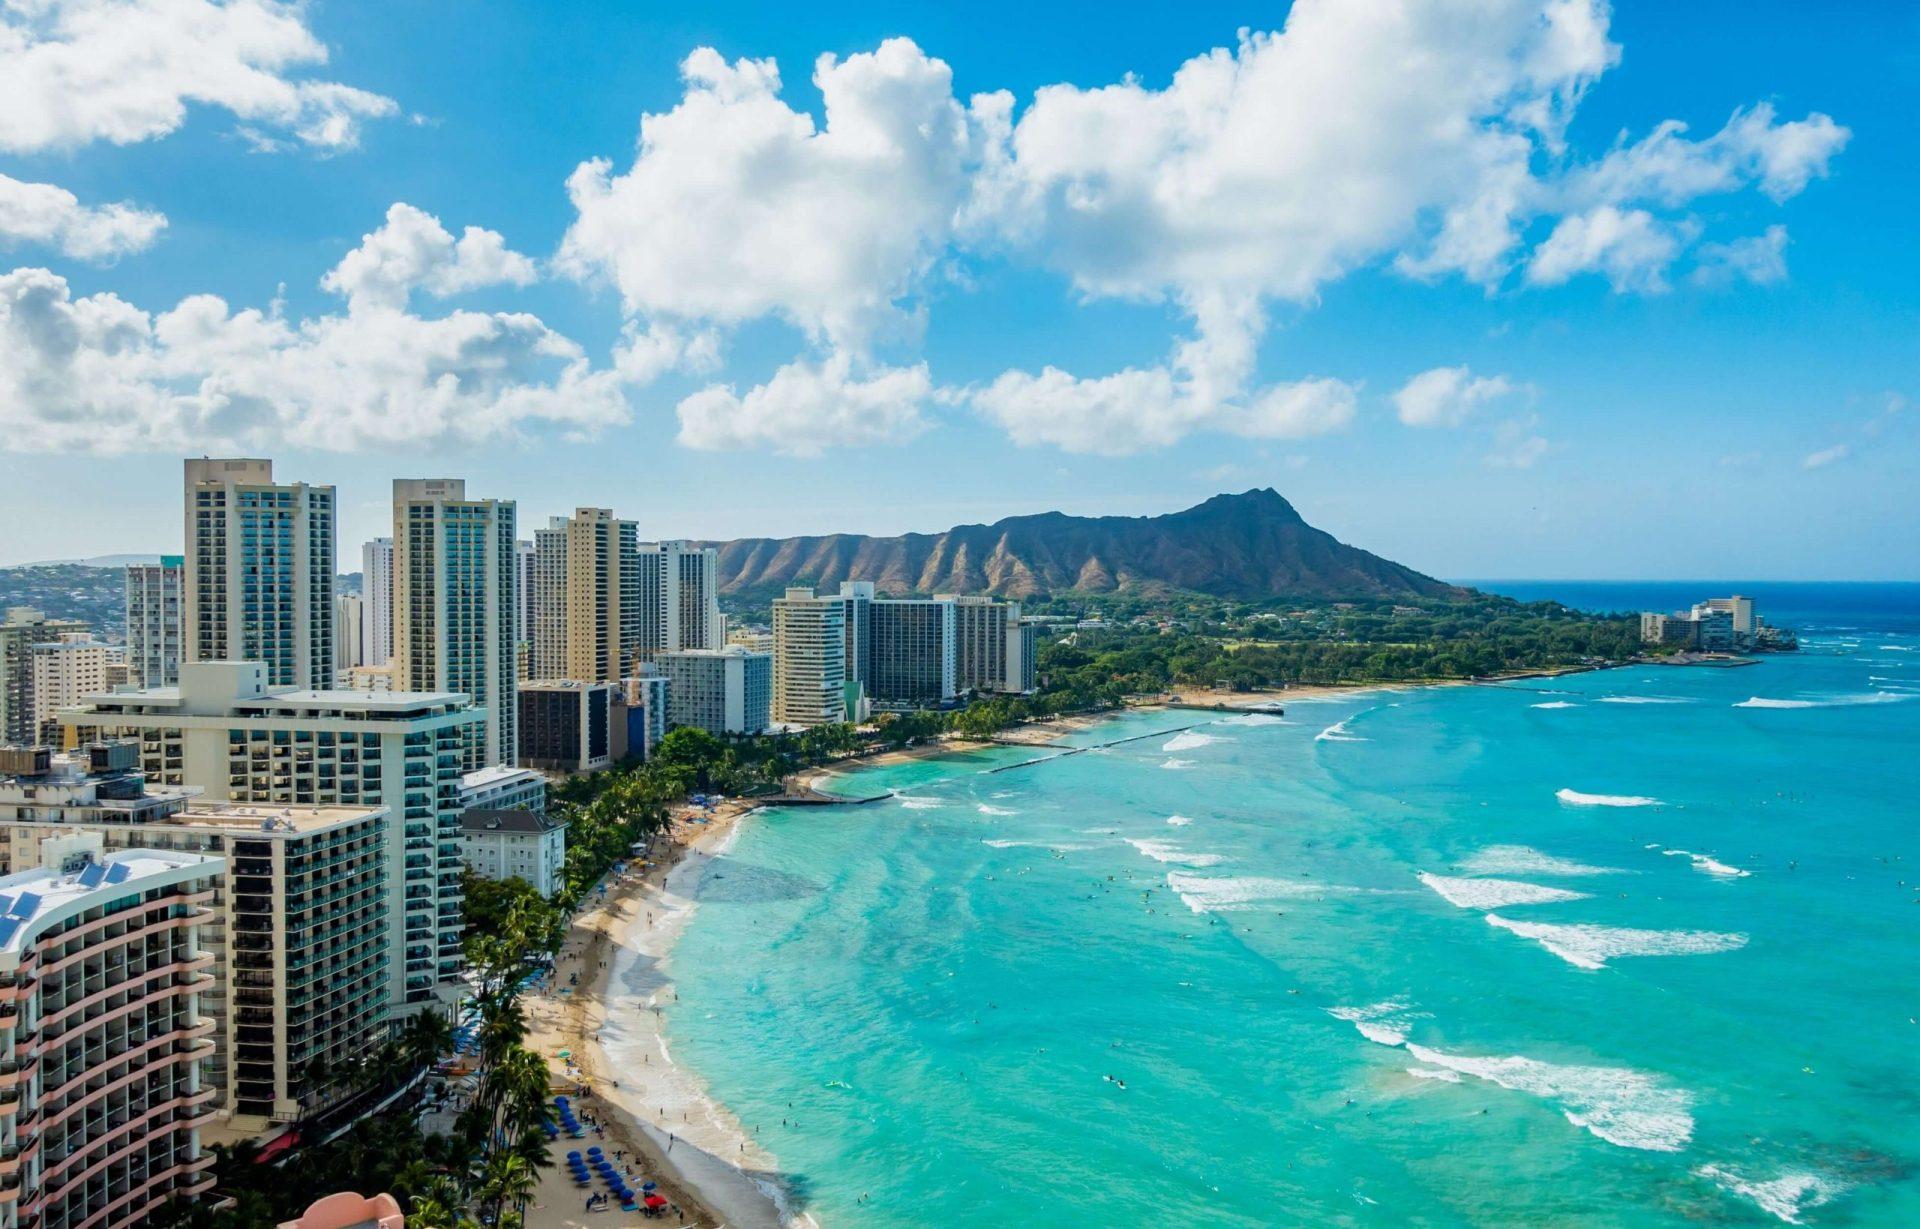 Ship your car to Hawaii